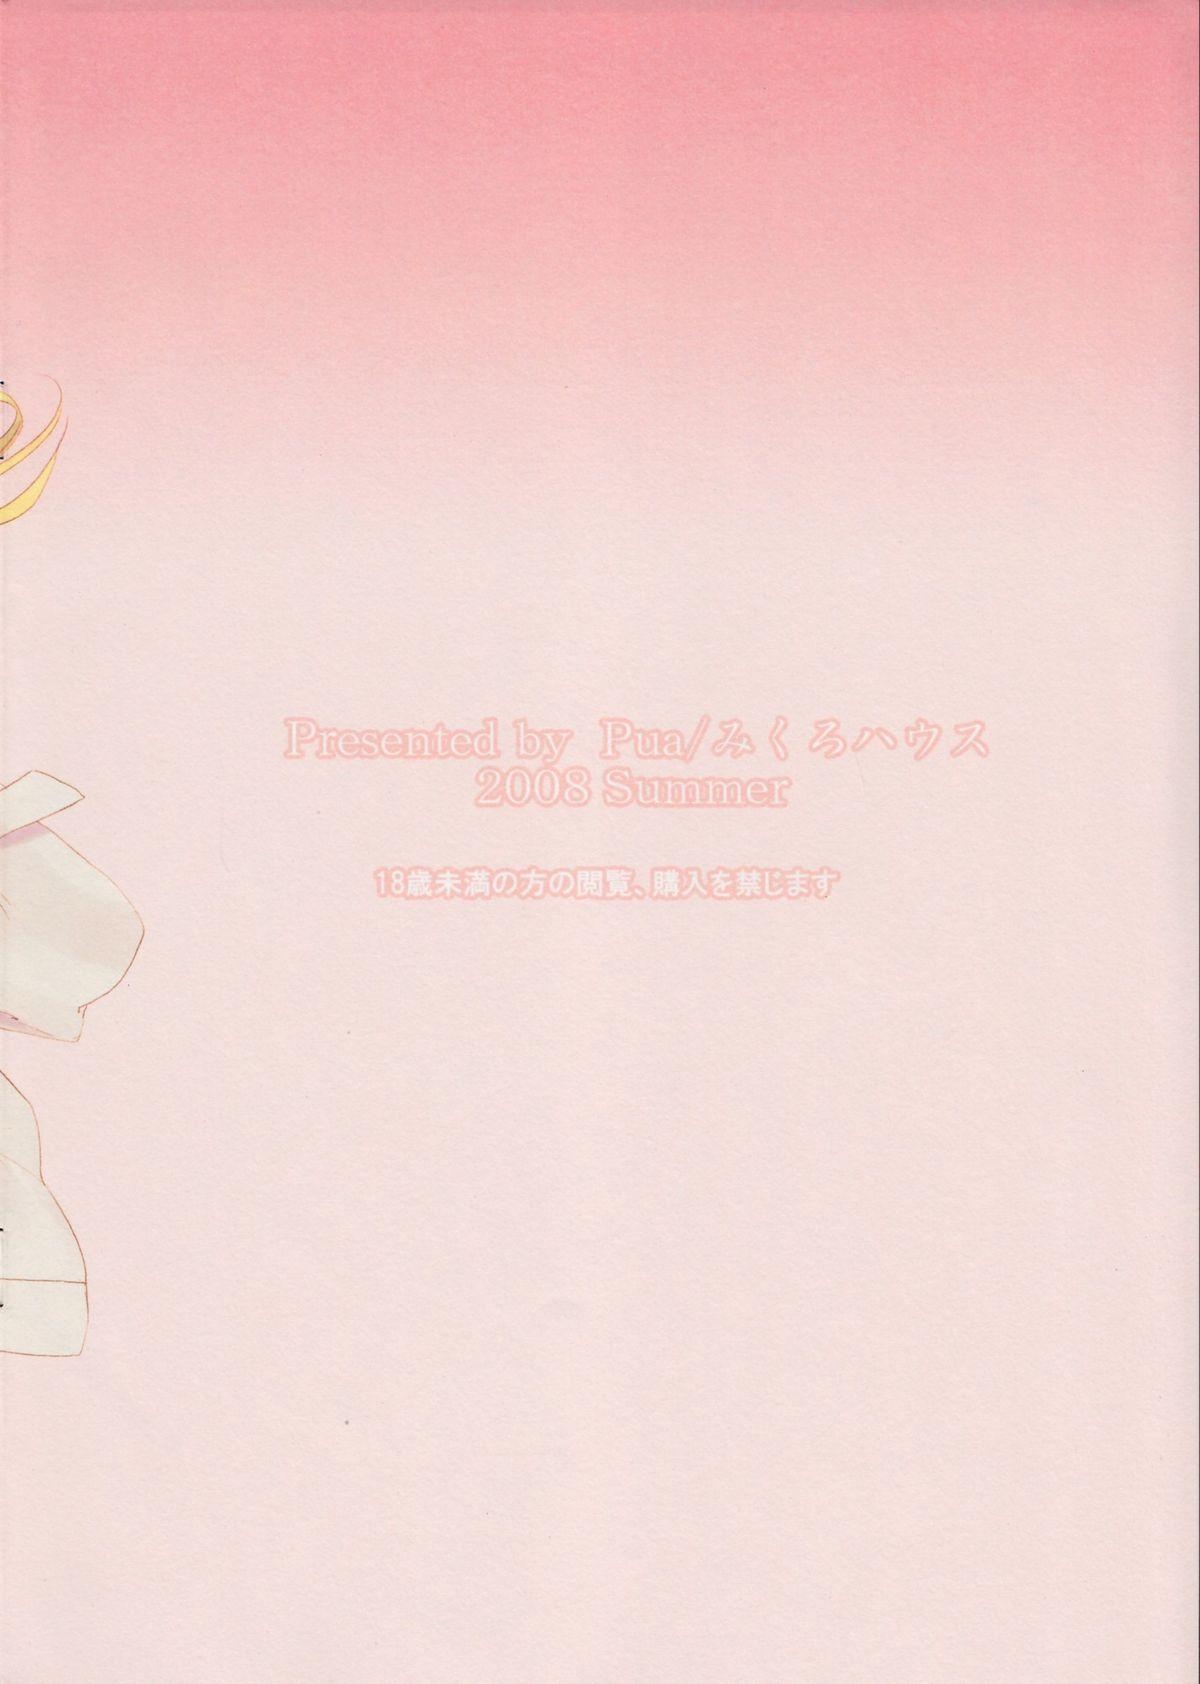 Gensou Shouten 25